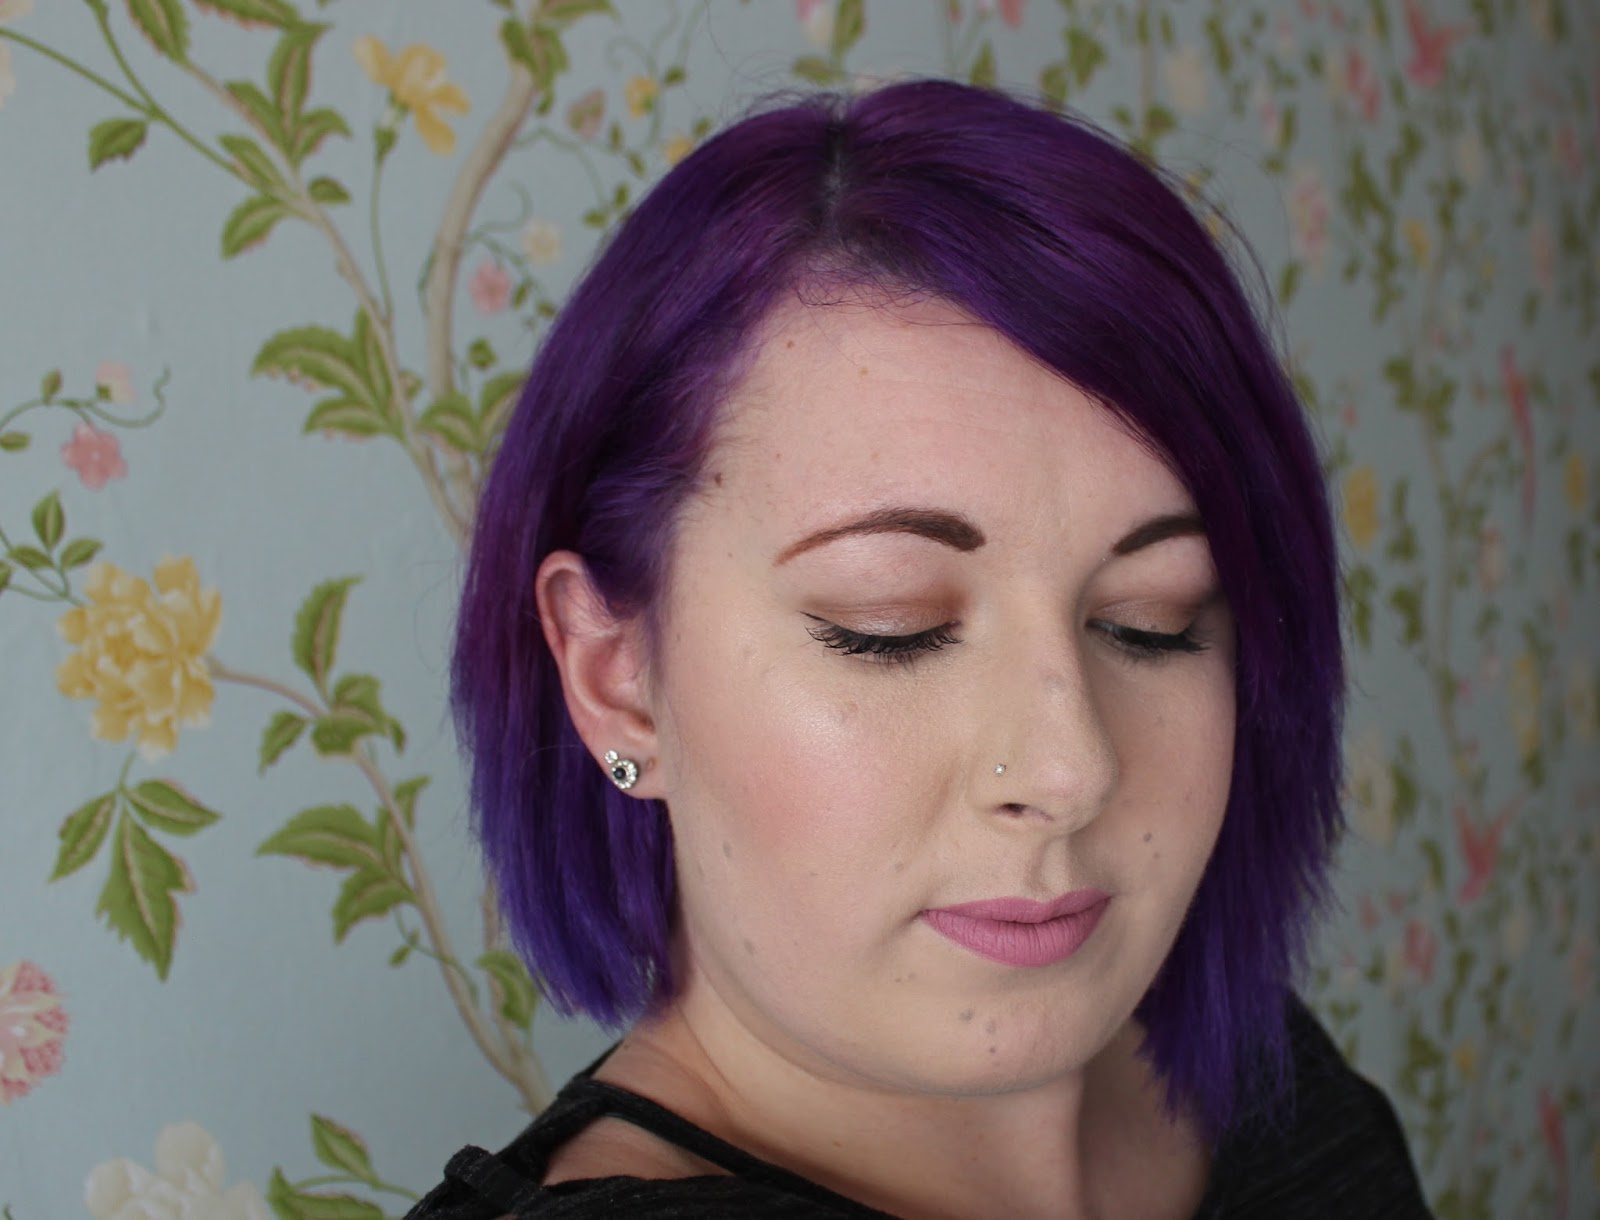 mac pink plaid lipstick review